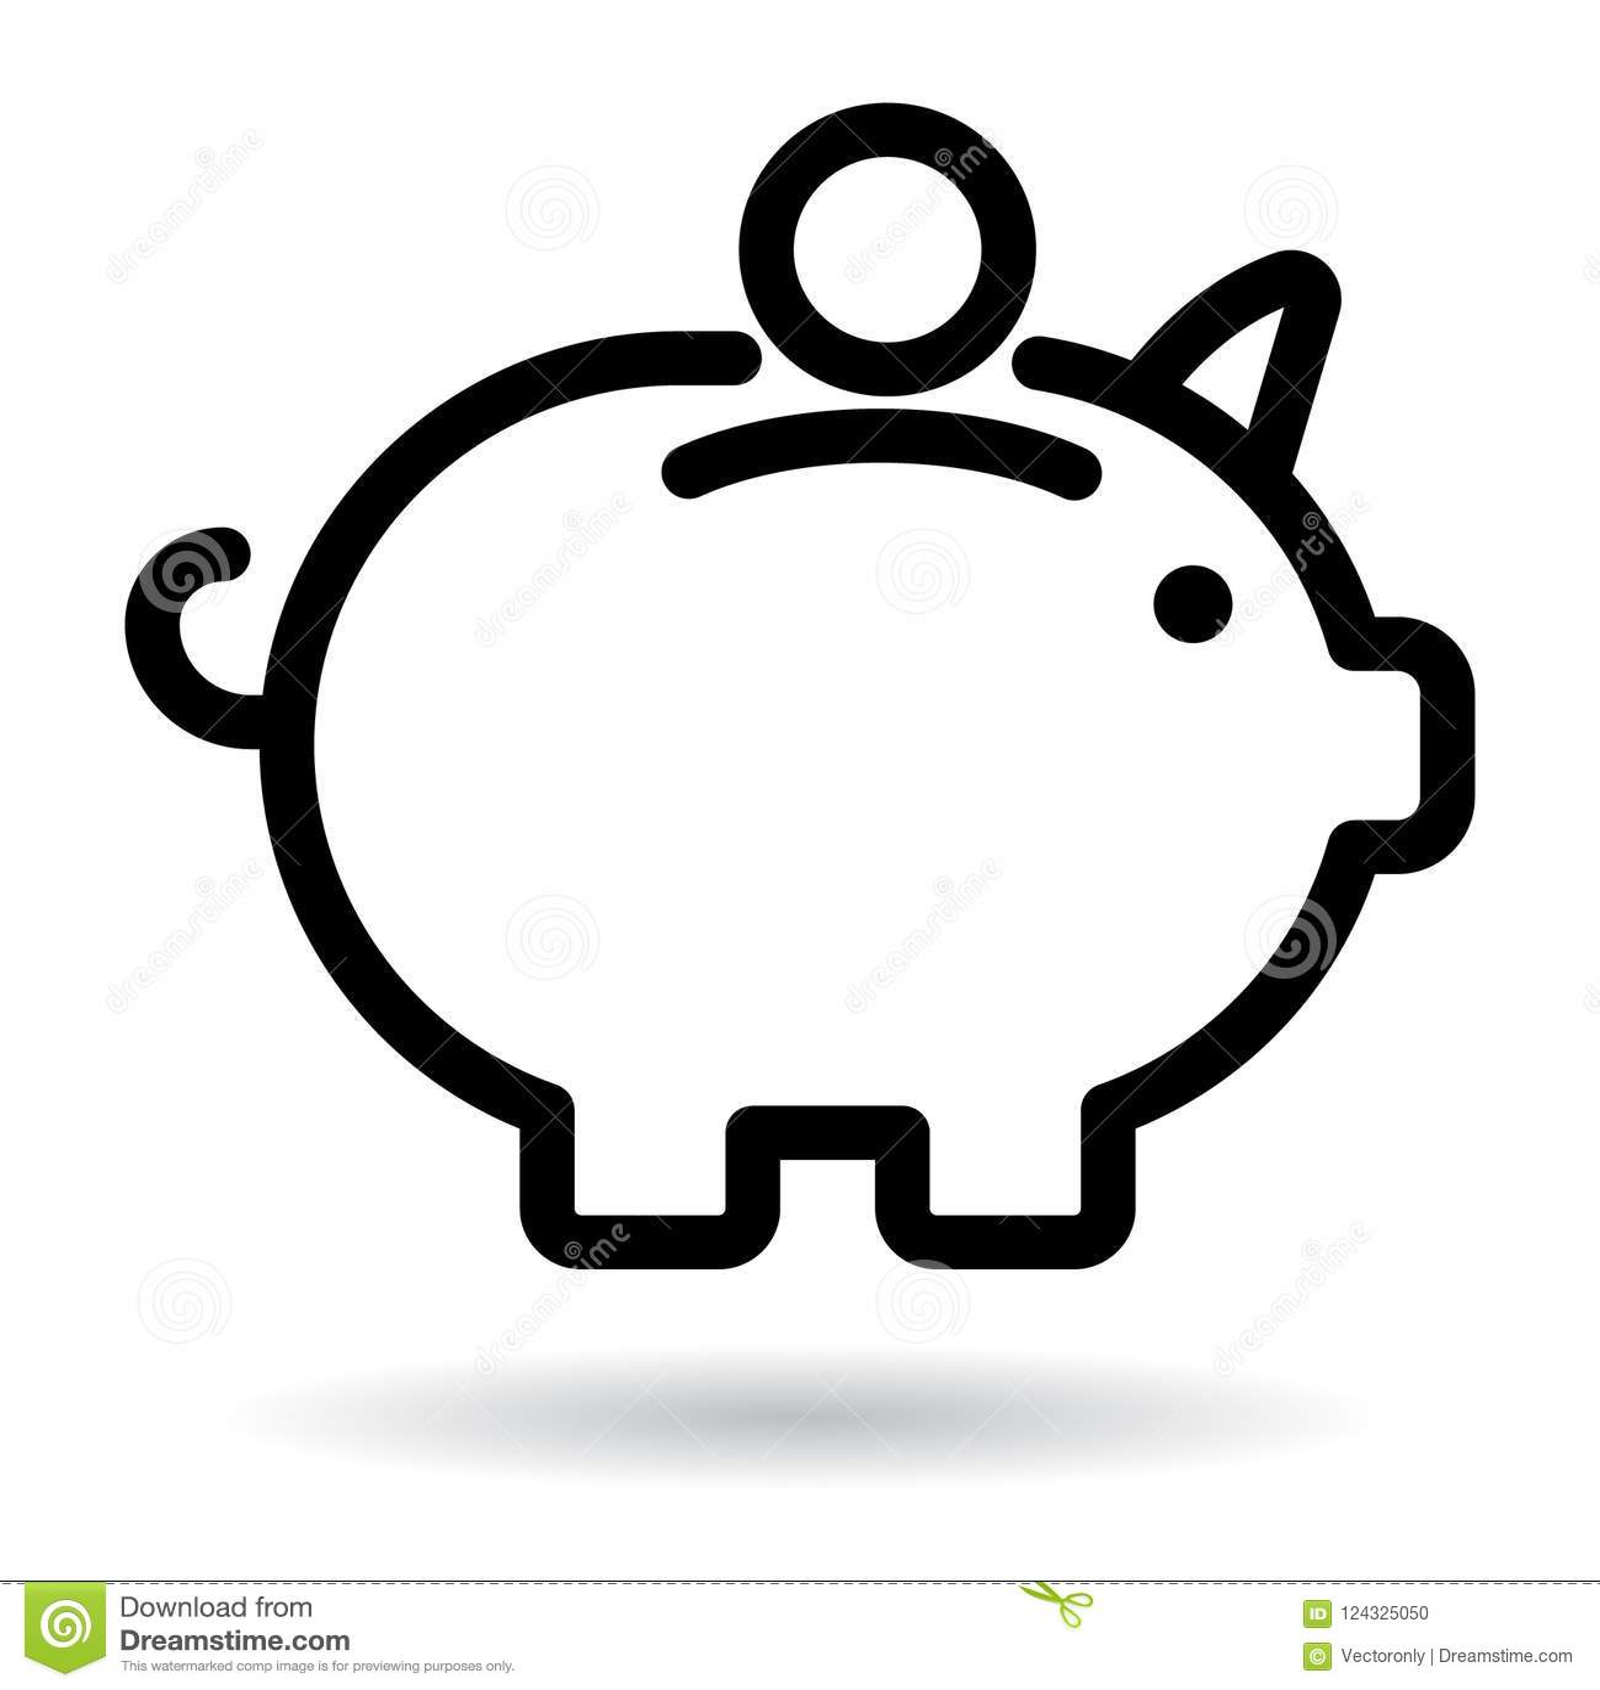 Piggy bank icon black